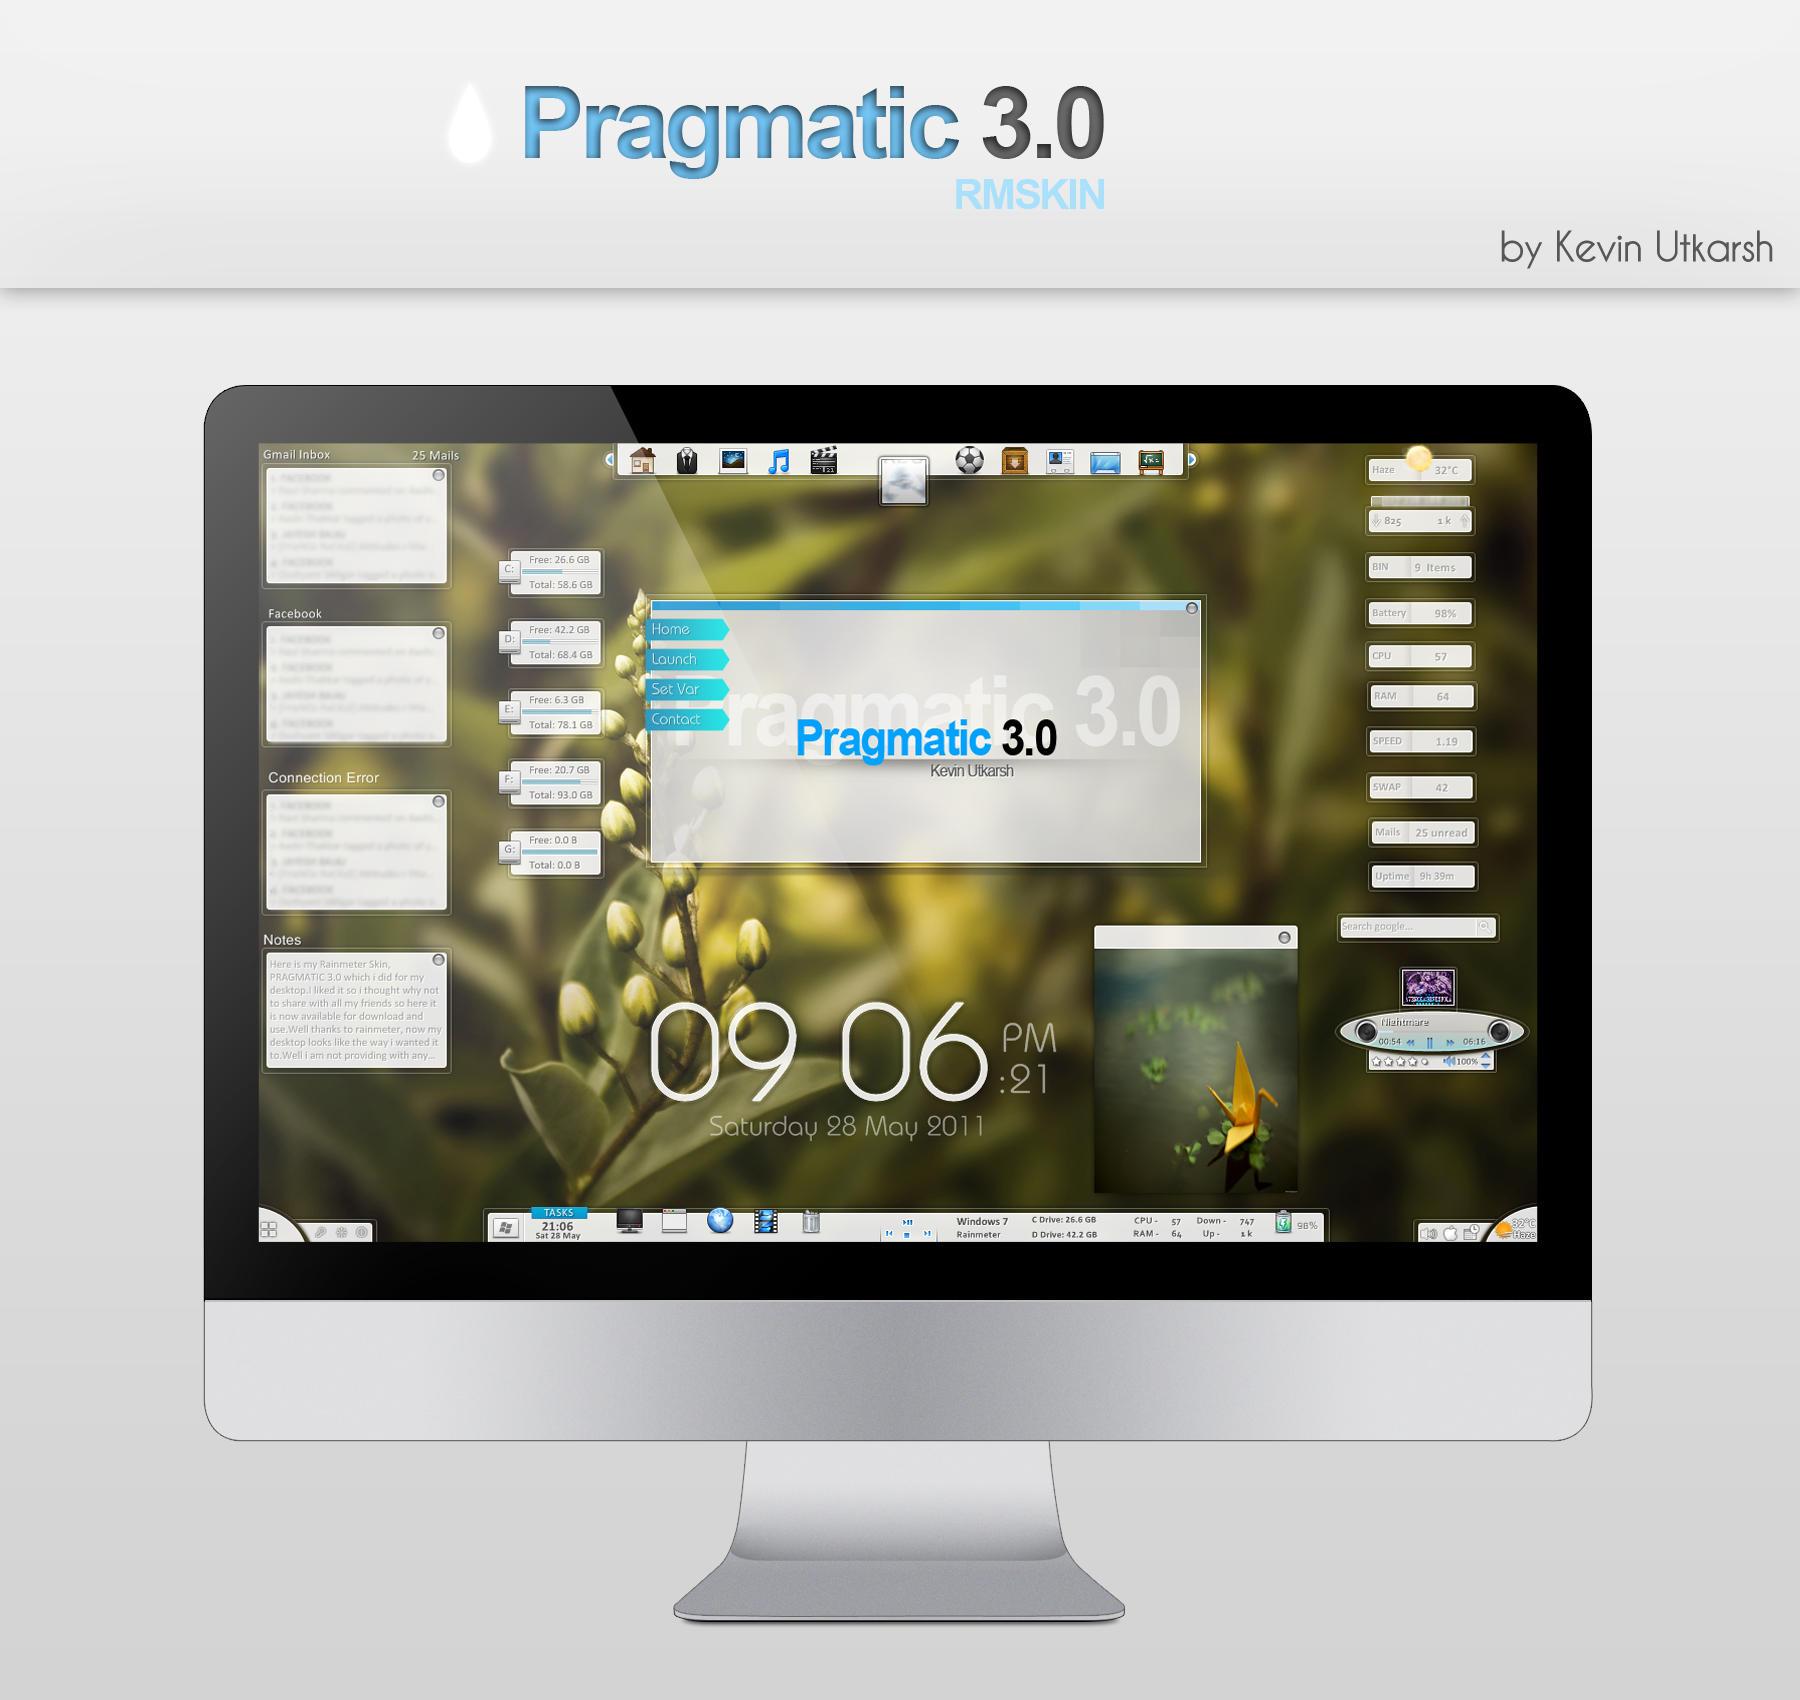 Pragmatic 3.0 by kevin-utkarsh